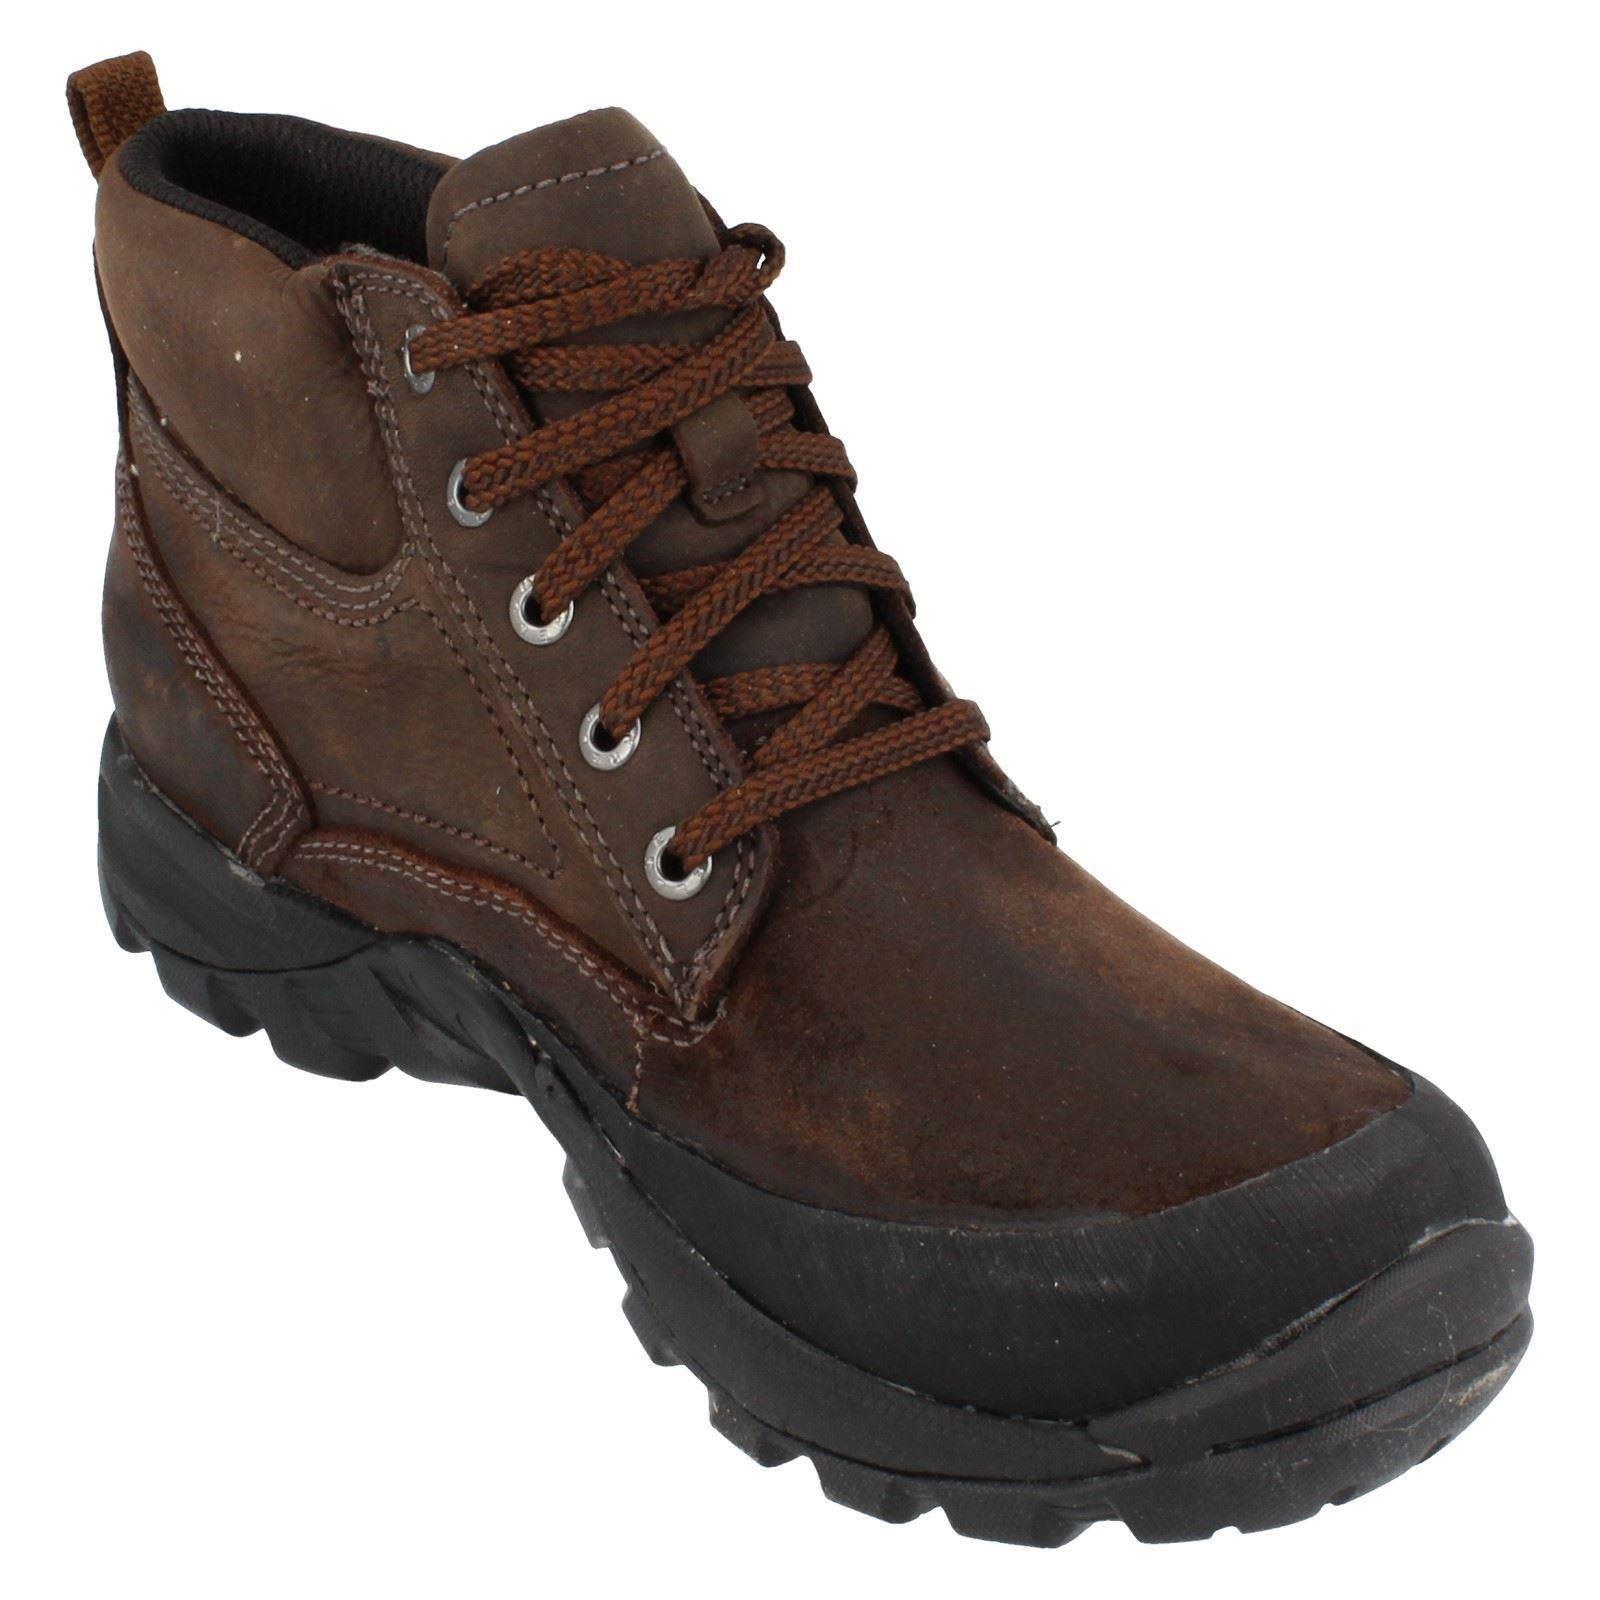 Mens Mens Mens Merrell Lace Up Ankle Stiefel Arlberg Waterproof 94b099